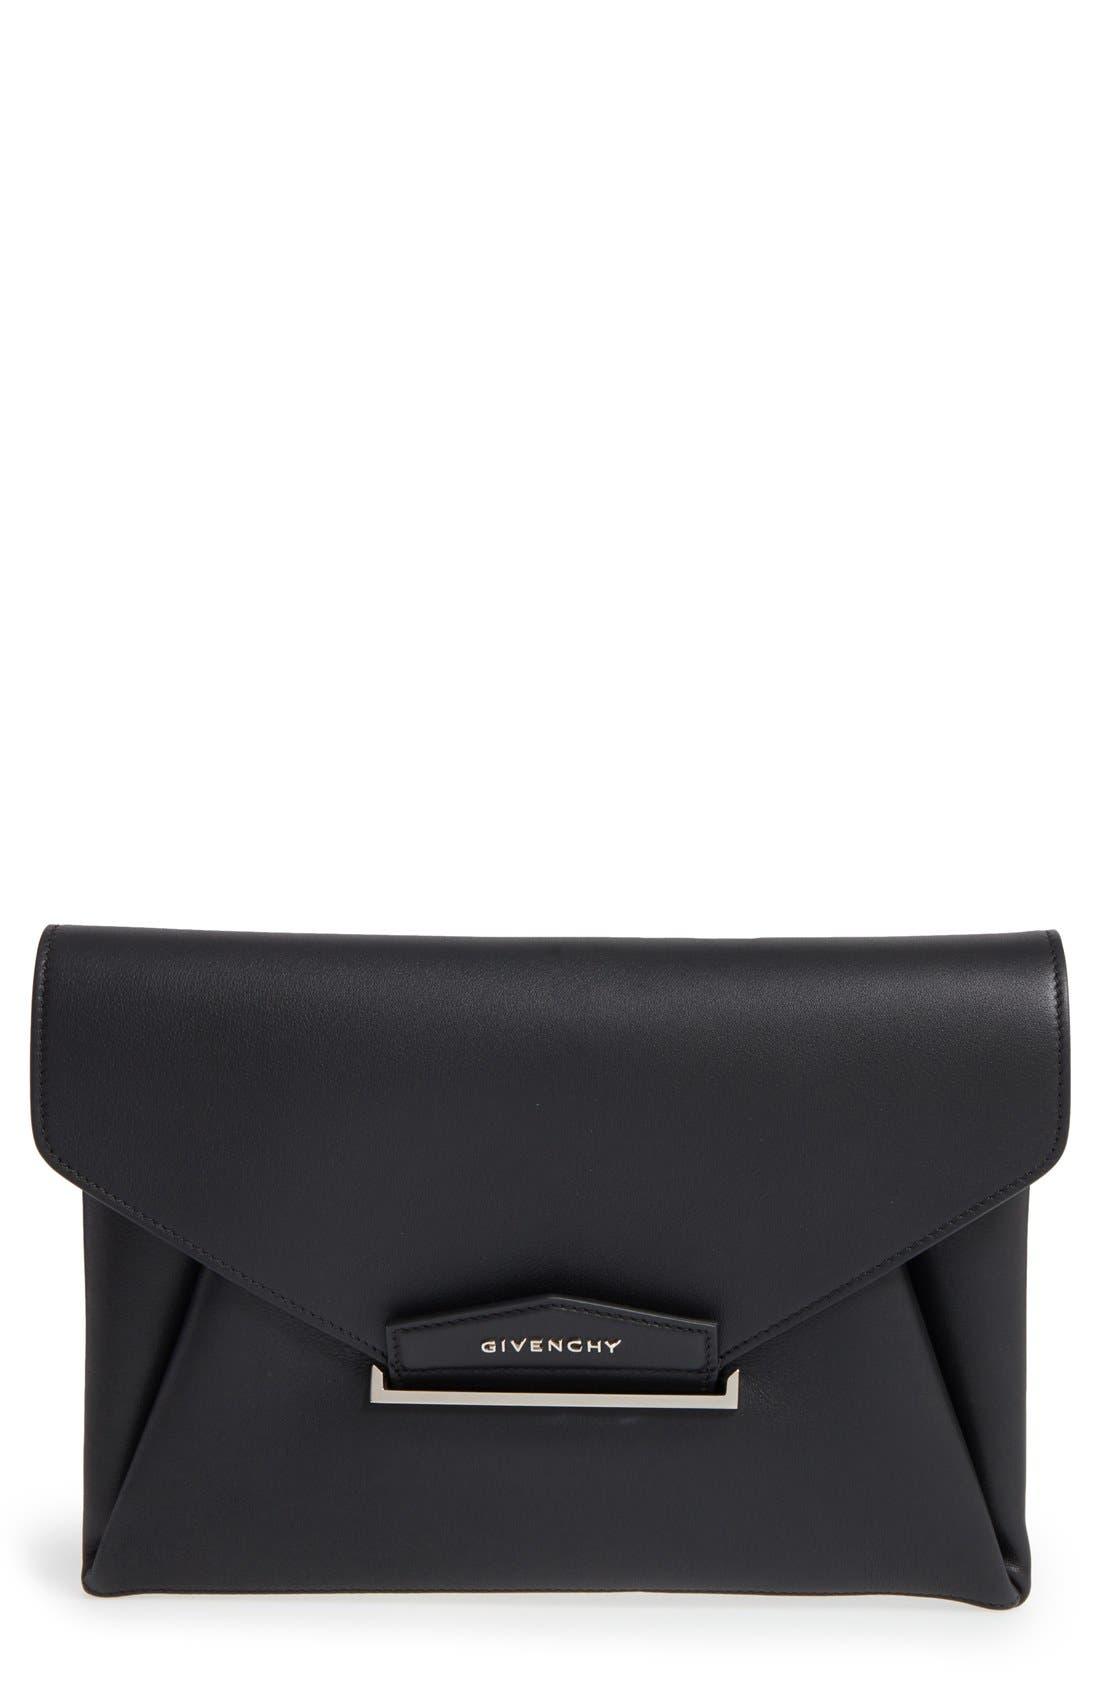 'Medium Antigona' Leather Envelope Clutch,                             Main thumbnail 1, color,                             Black